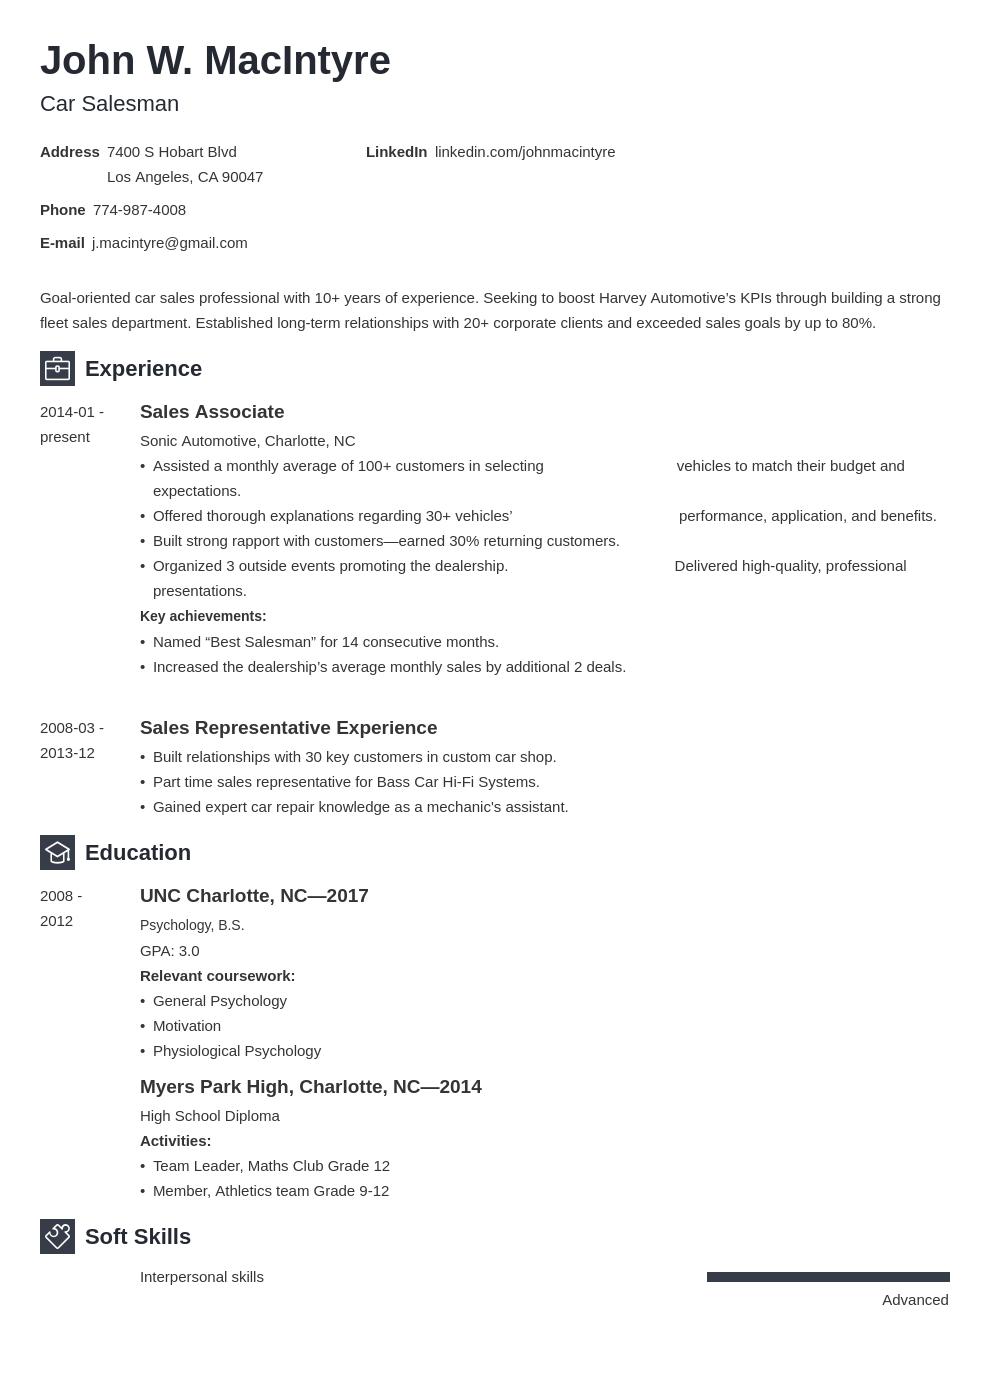 Car Salesman Resume Example Template Newcast Resume Examples Job Resume Examples Resume Layout